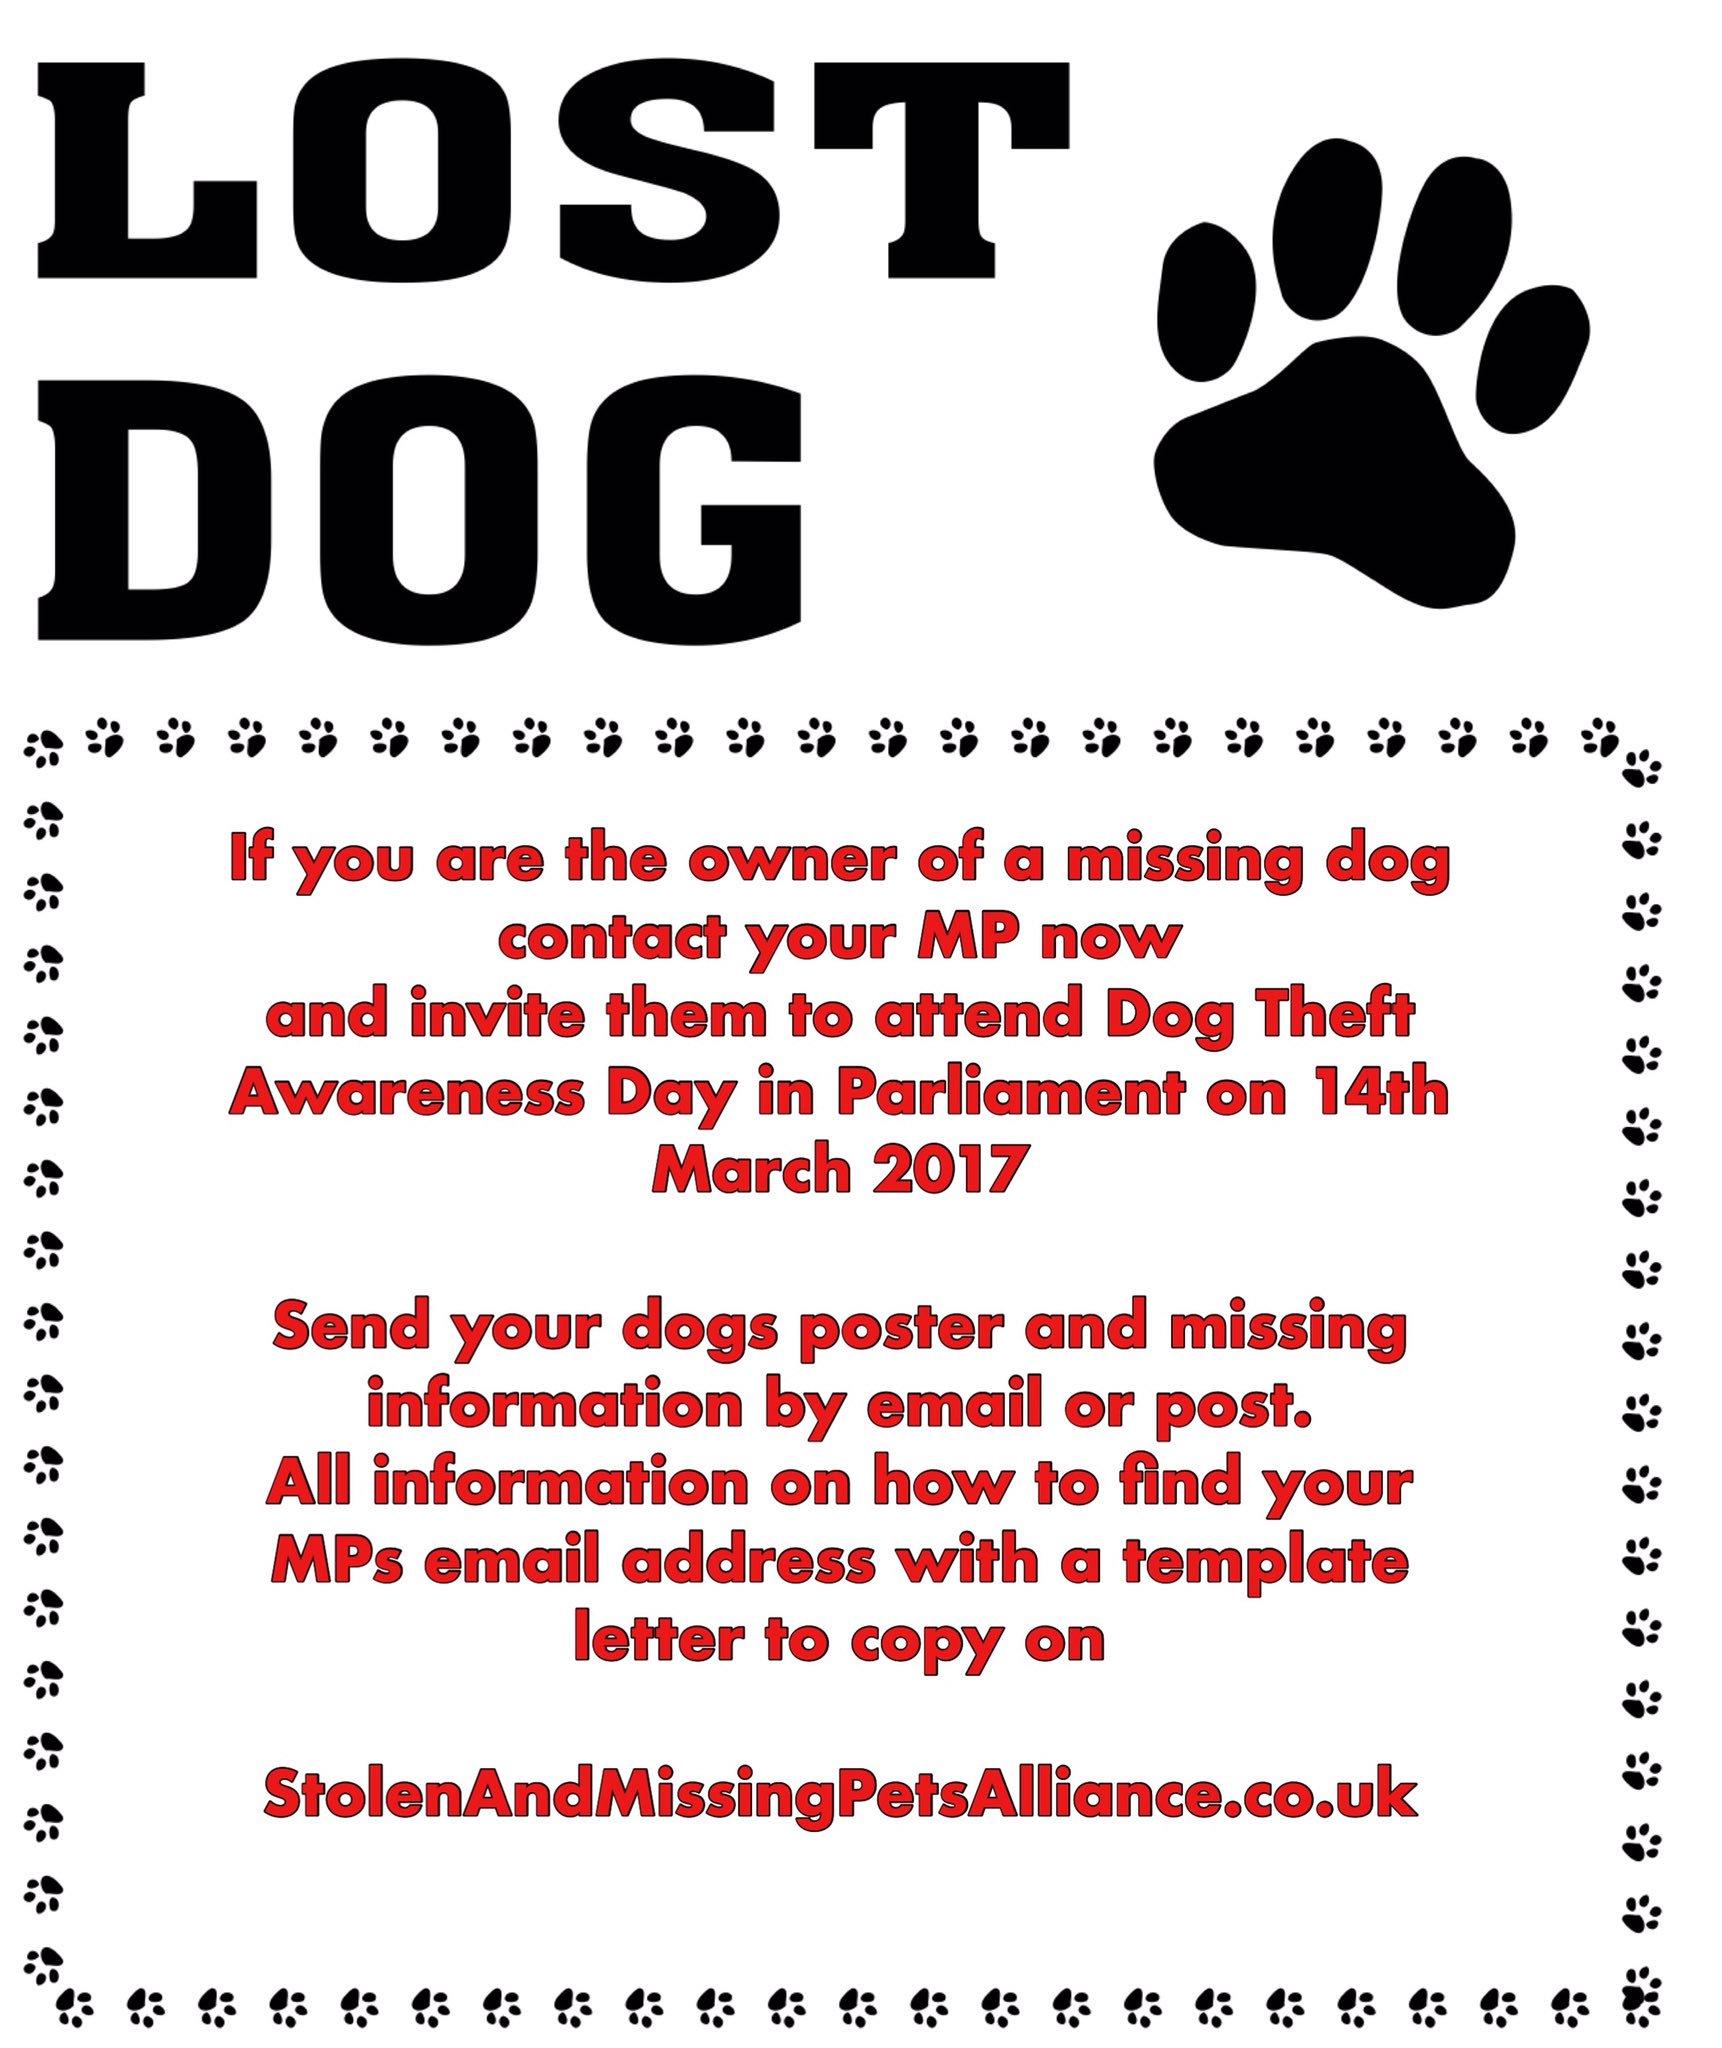 Lost Poster Template Fieldstationco C4pnE FWYAAWprL Lost Poster Template  Lost Poster Template